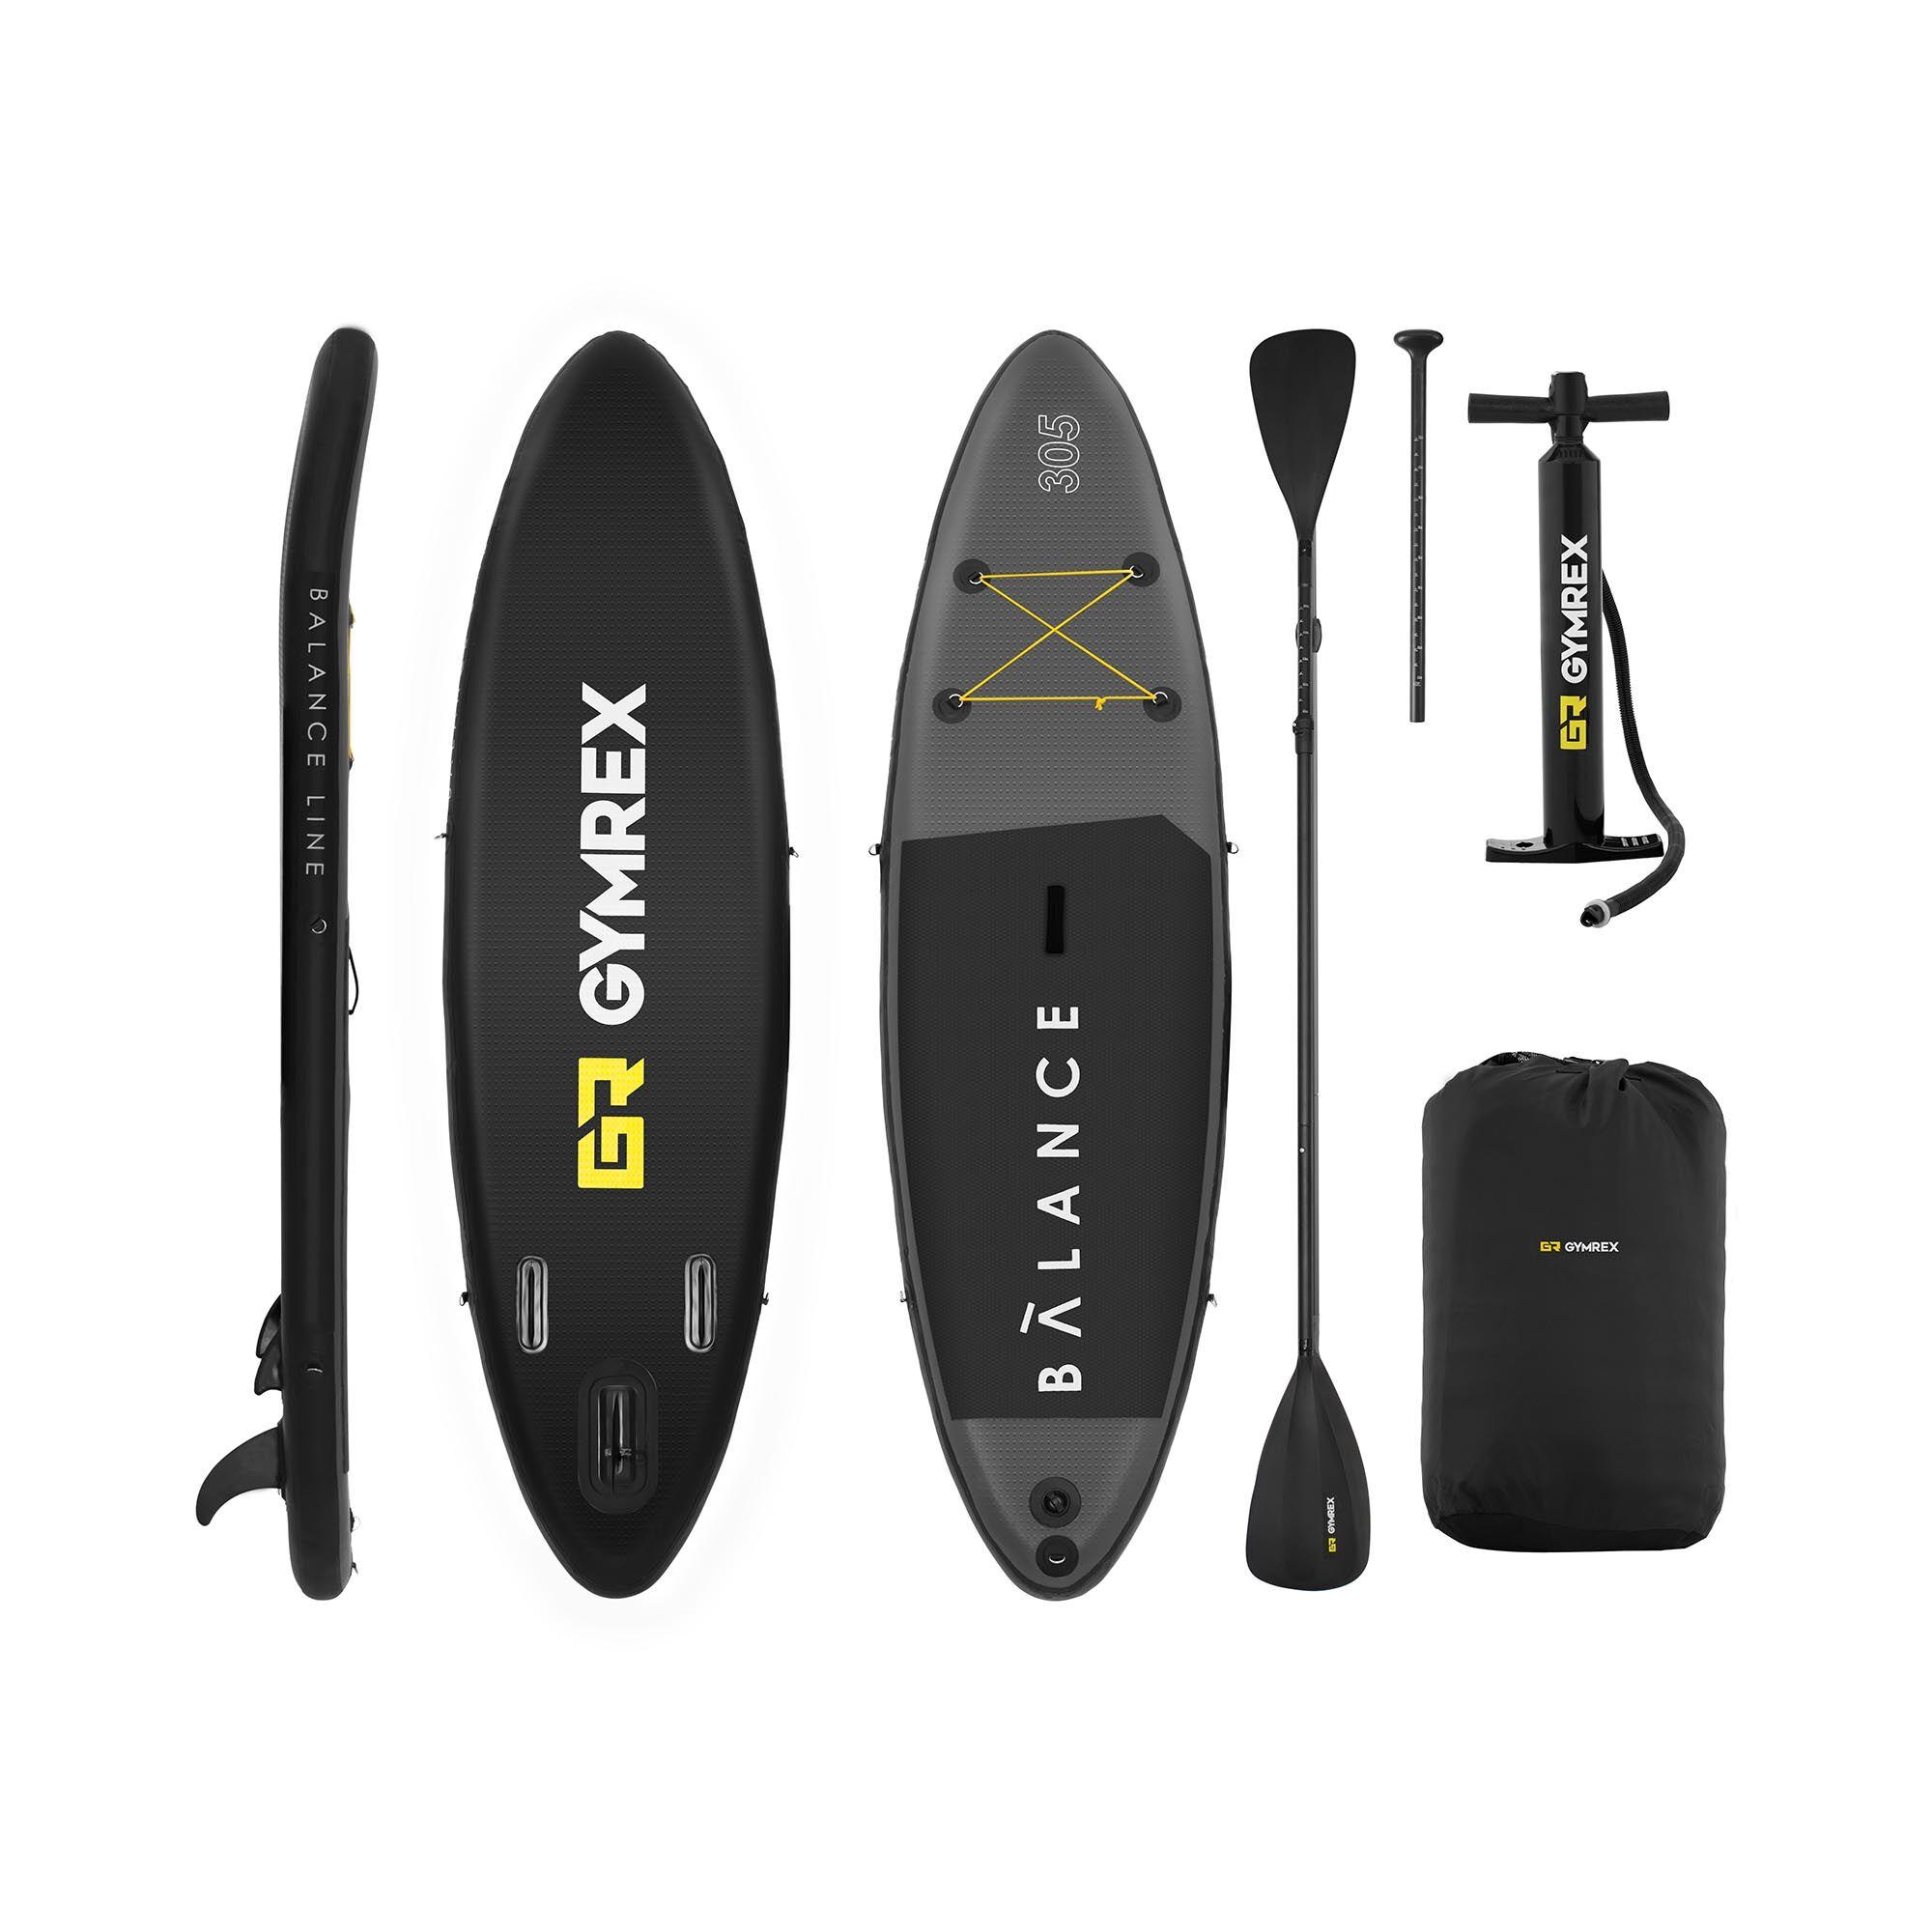 Gymrex Stand Up Paddle Board Set - 135 kg - 305 x 79 x 15 cm GR-SPB305